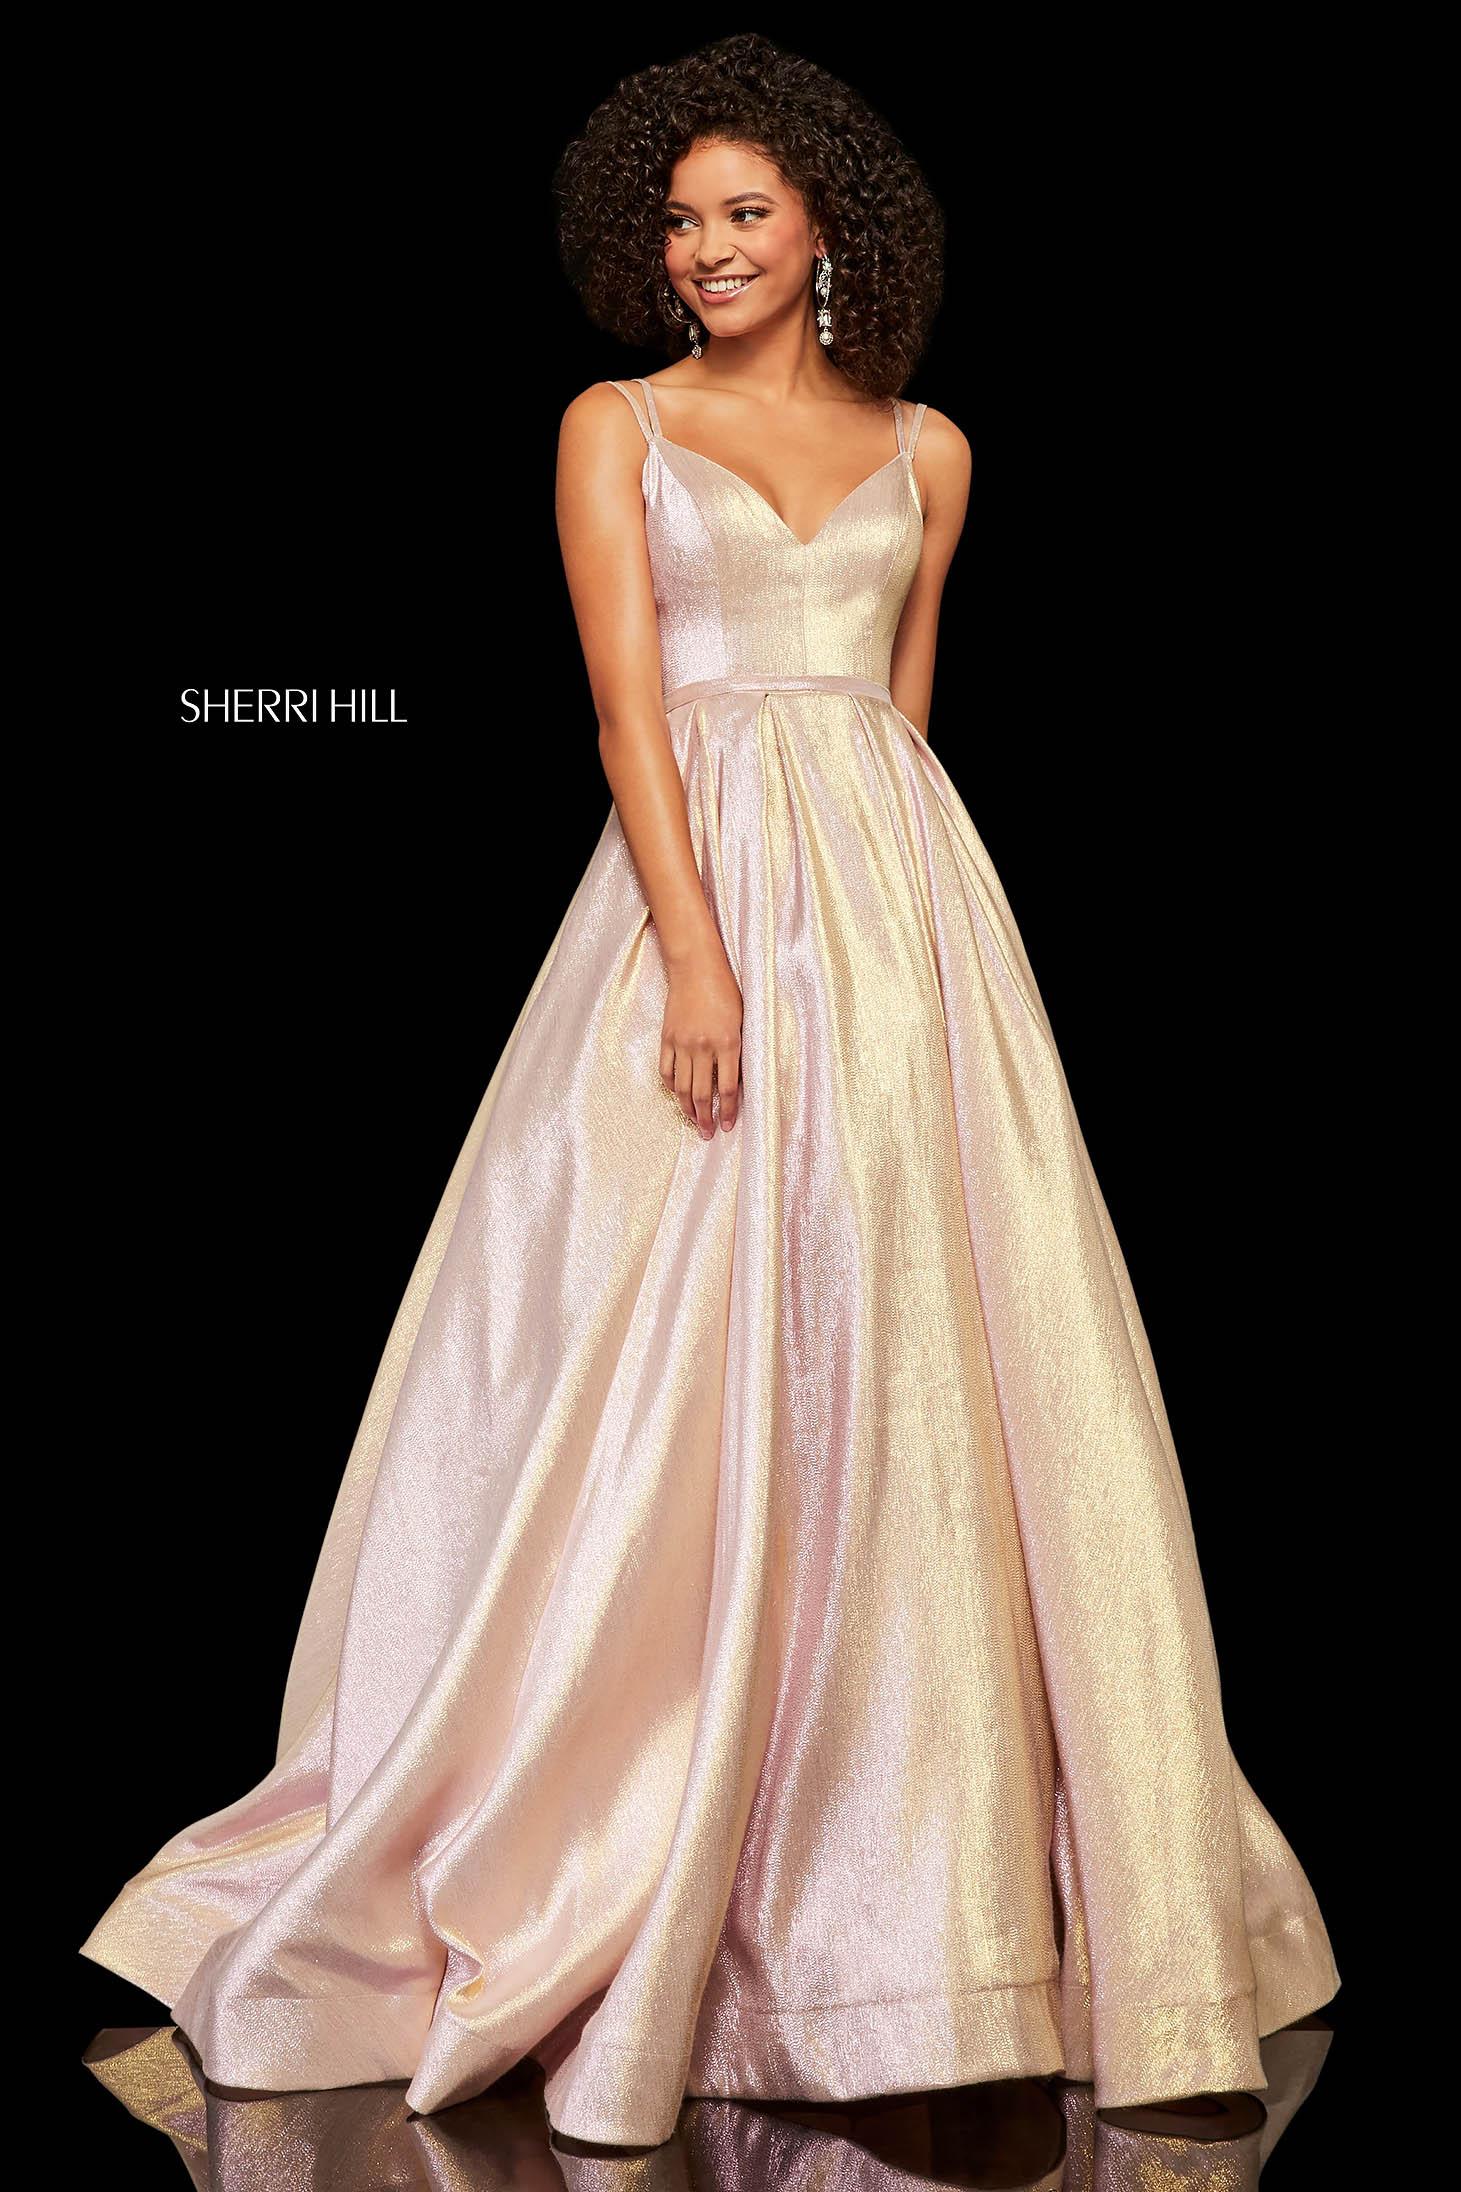 95857d367602 sherri-hill-52755-gold-dress-S042790-1-412850.jpg